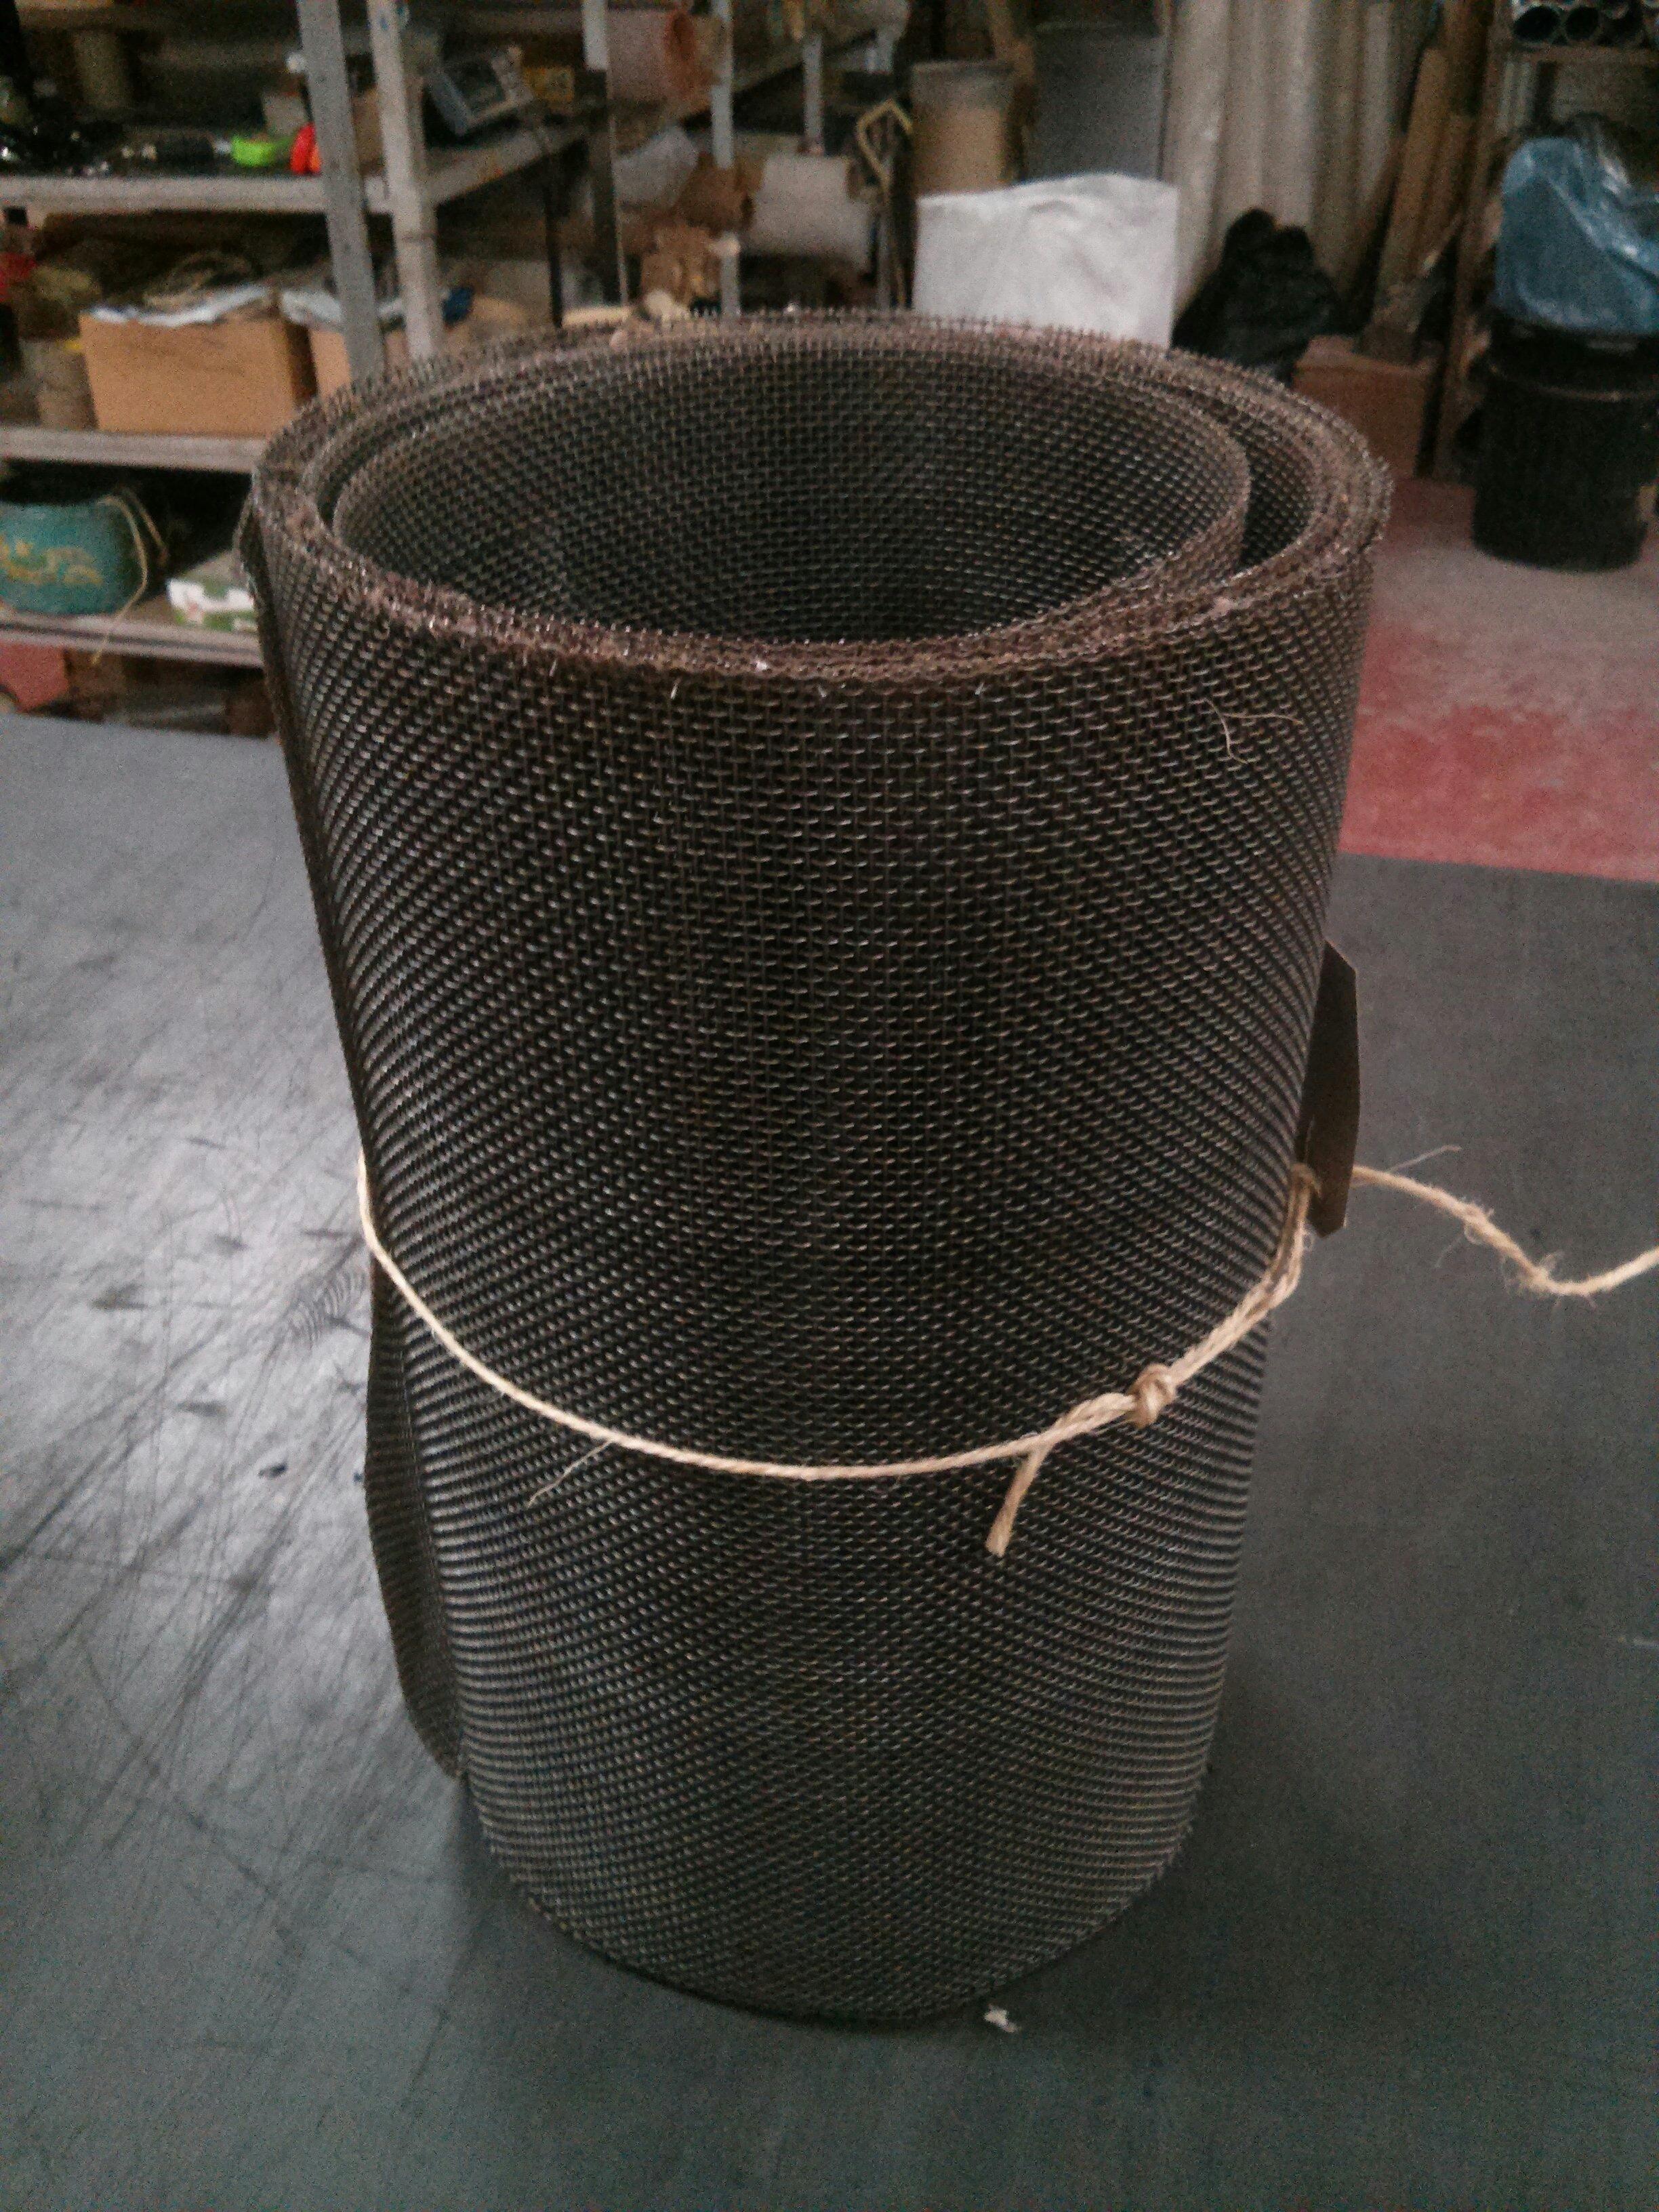 7m x 460mm, mild steel woven 6 mesh: 3.52mm aperture OC3